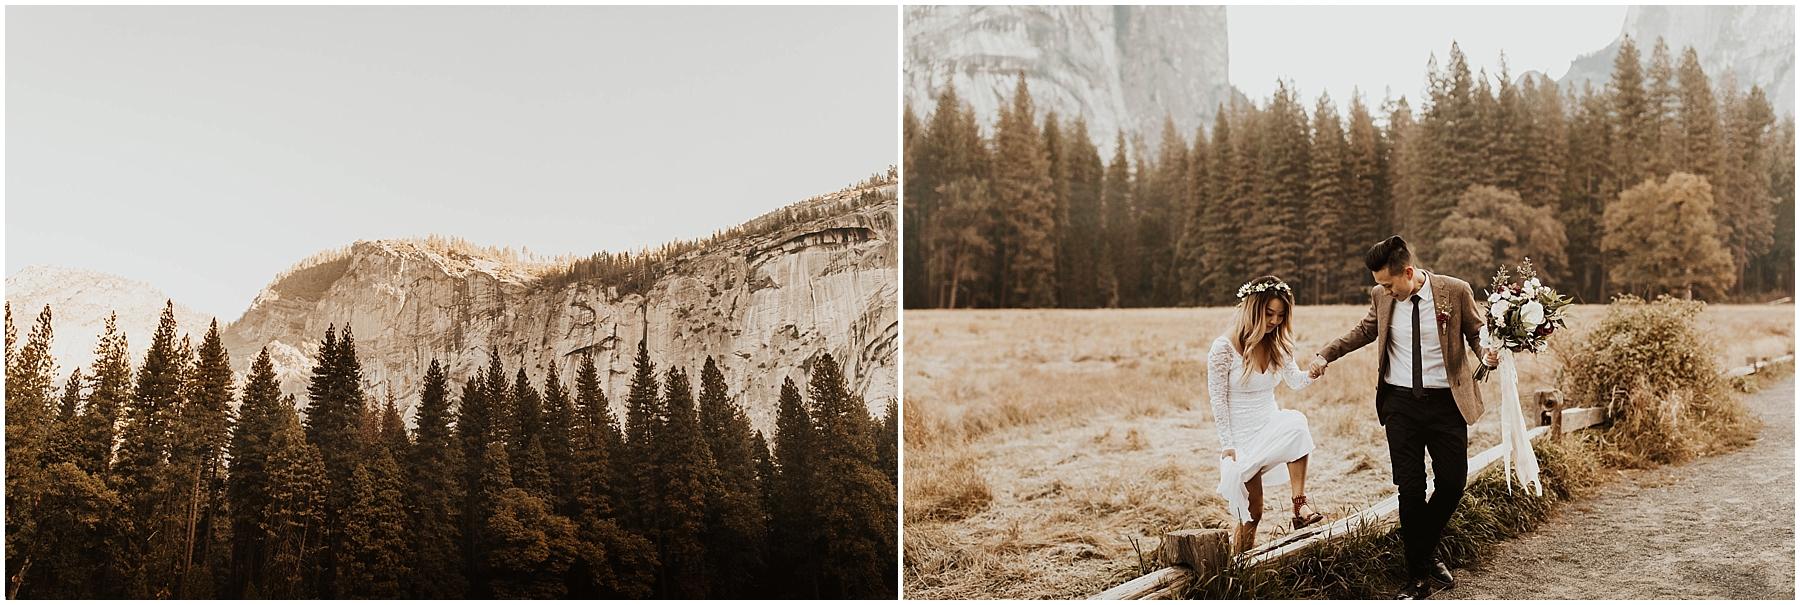 Yosemite_elopement_0031.jpg